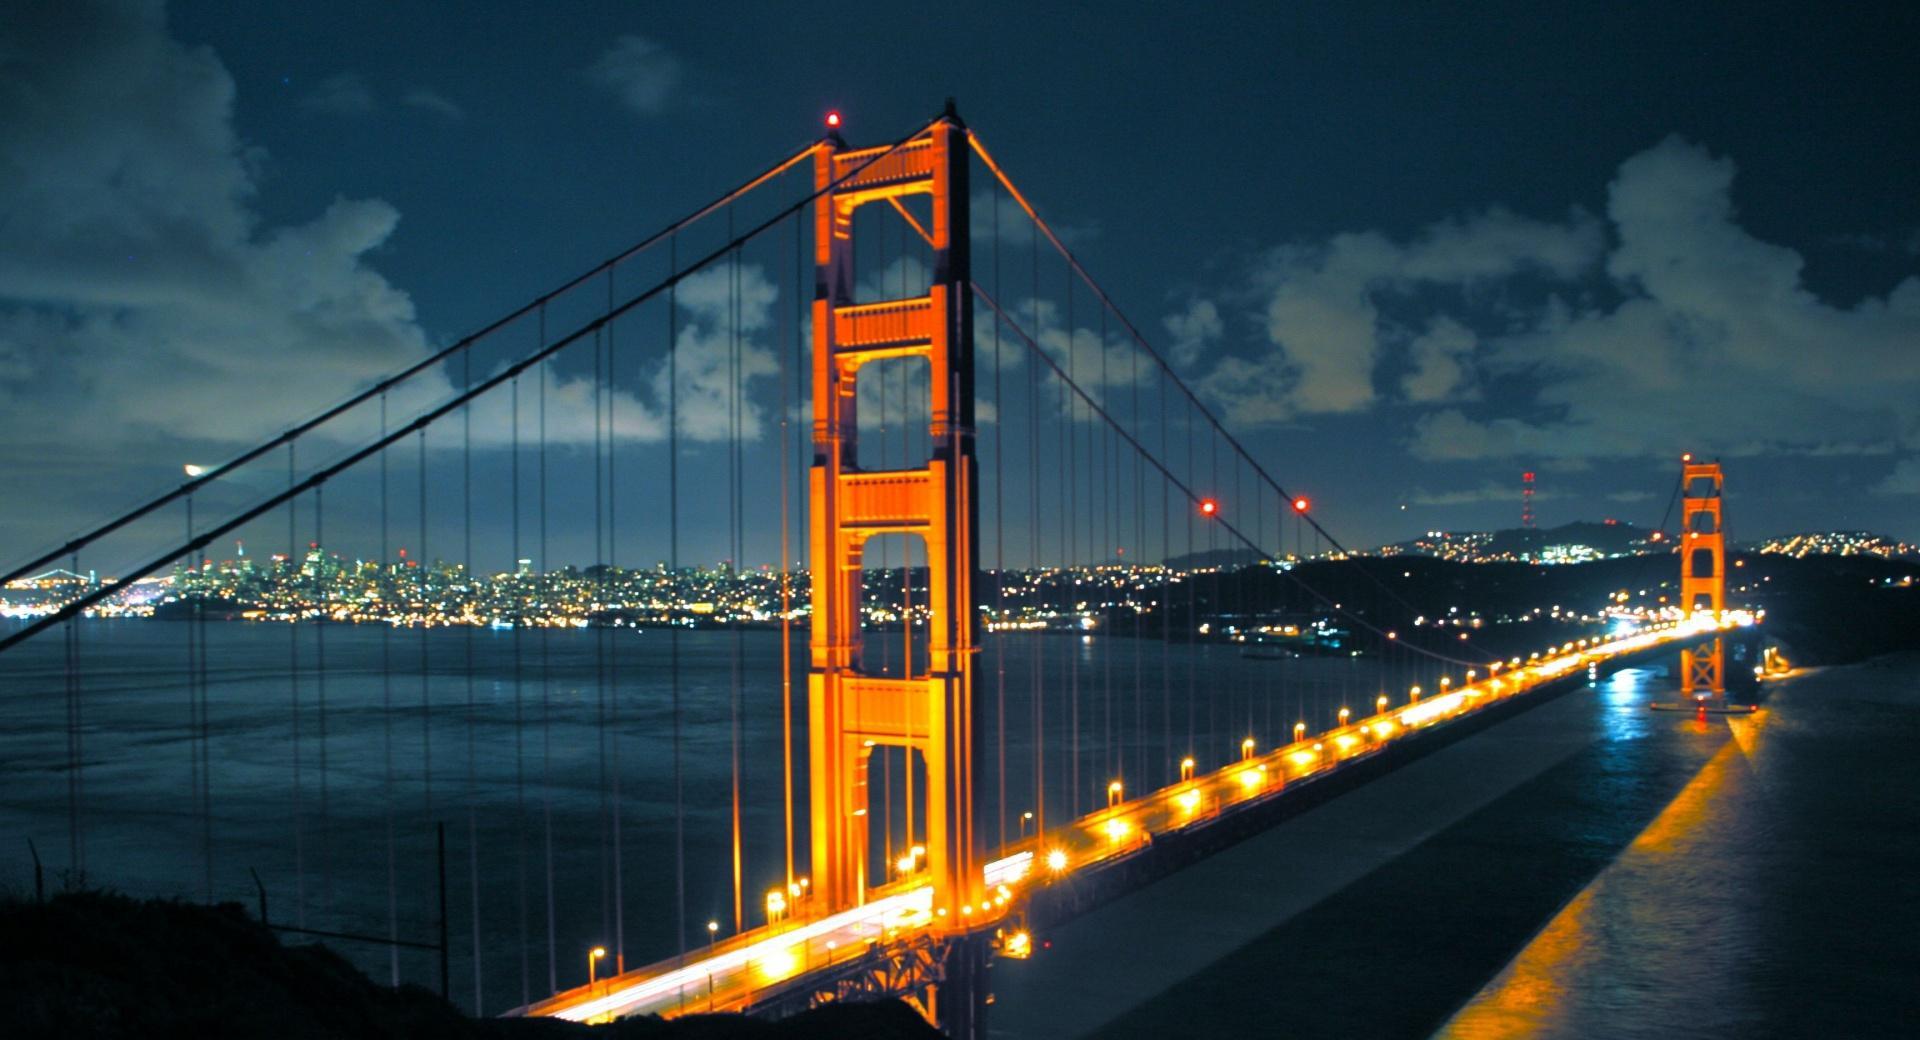 Night Golden Gate Bridge wallpapers HD quality